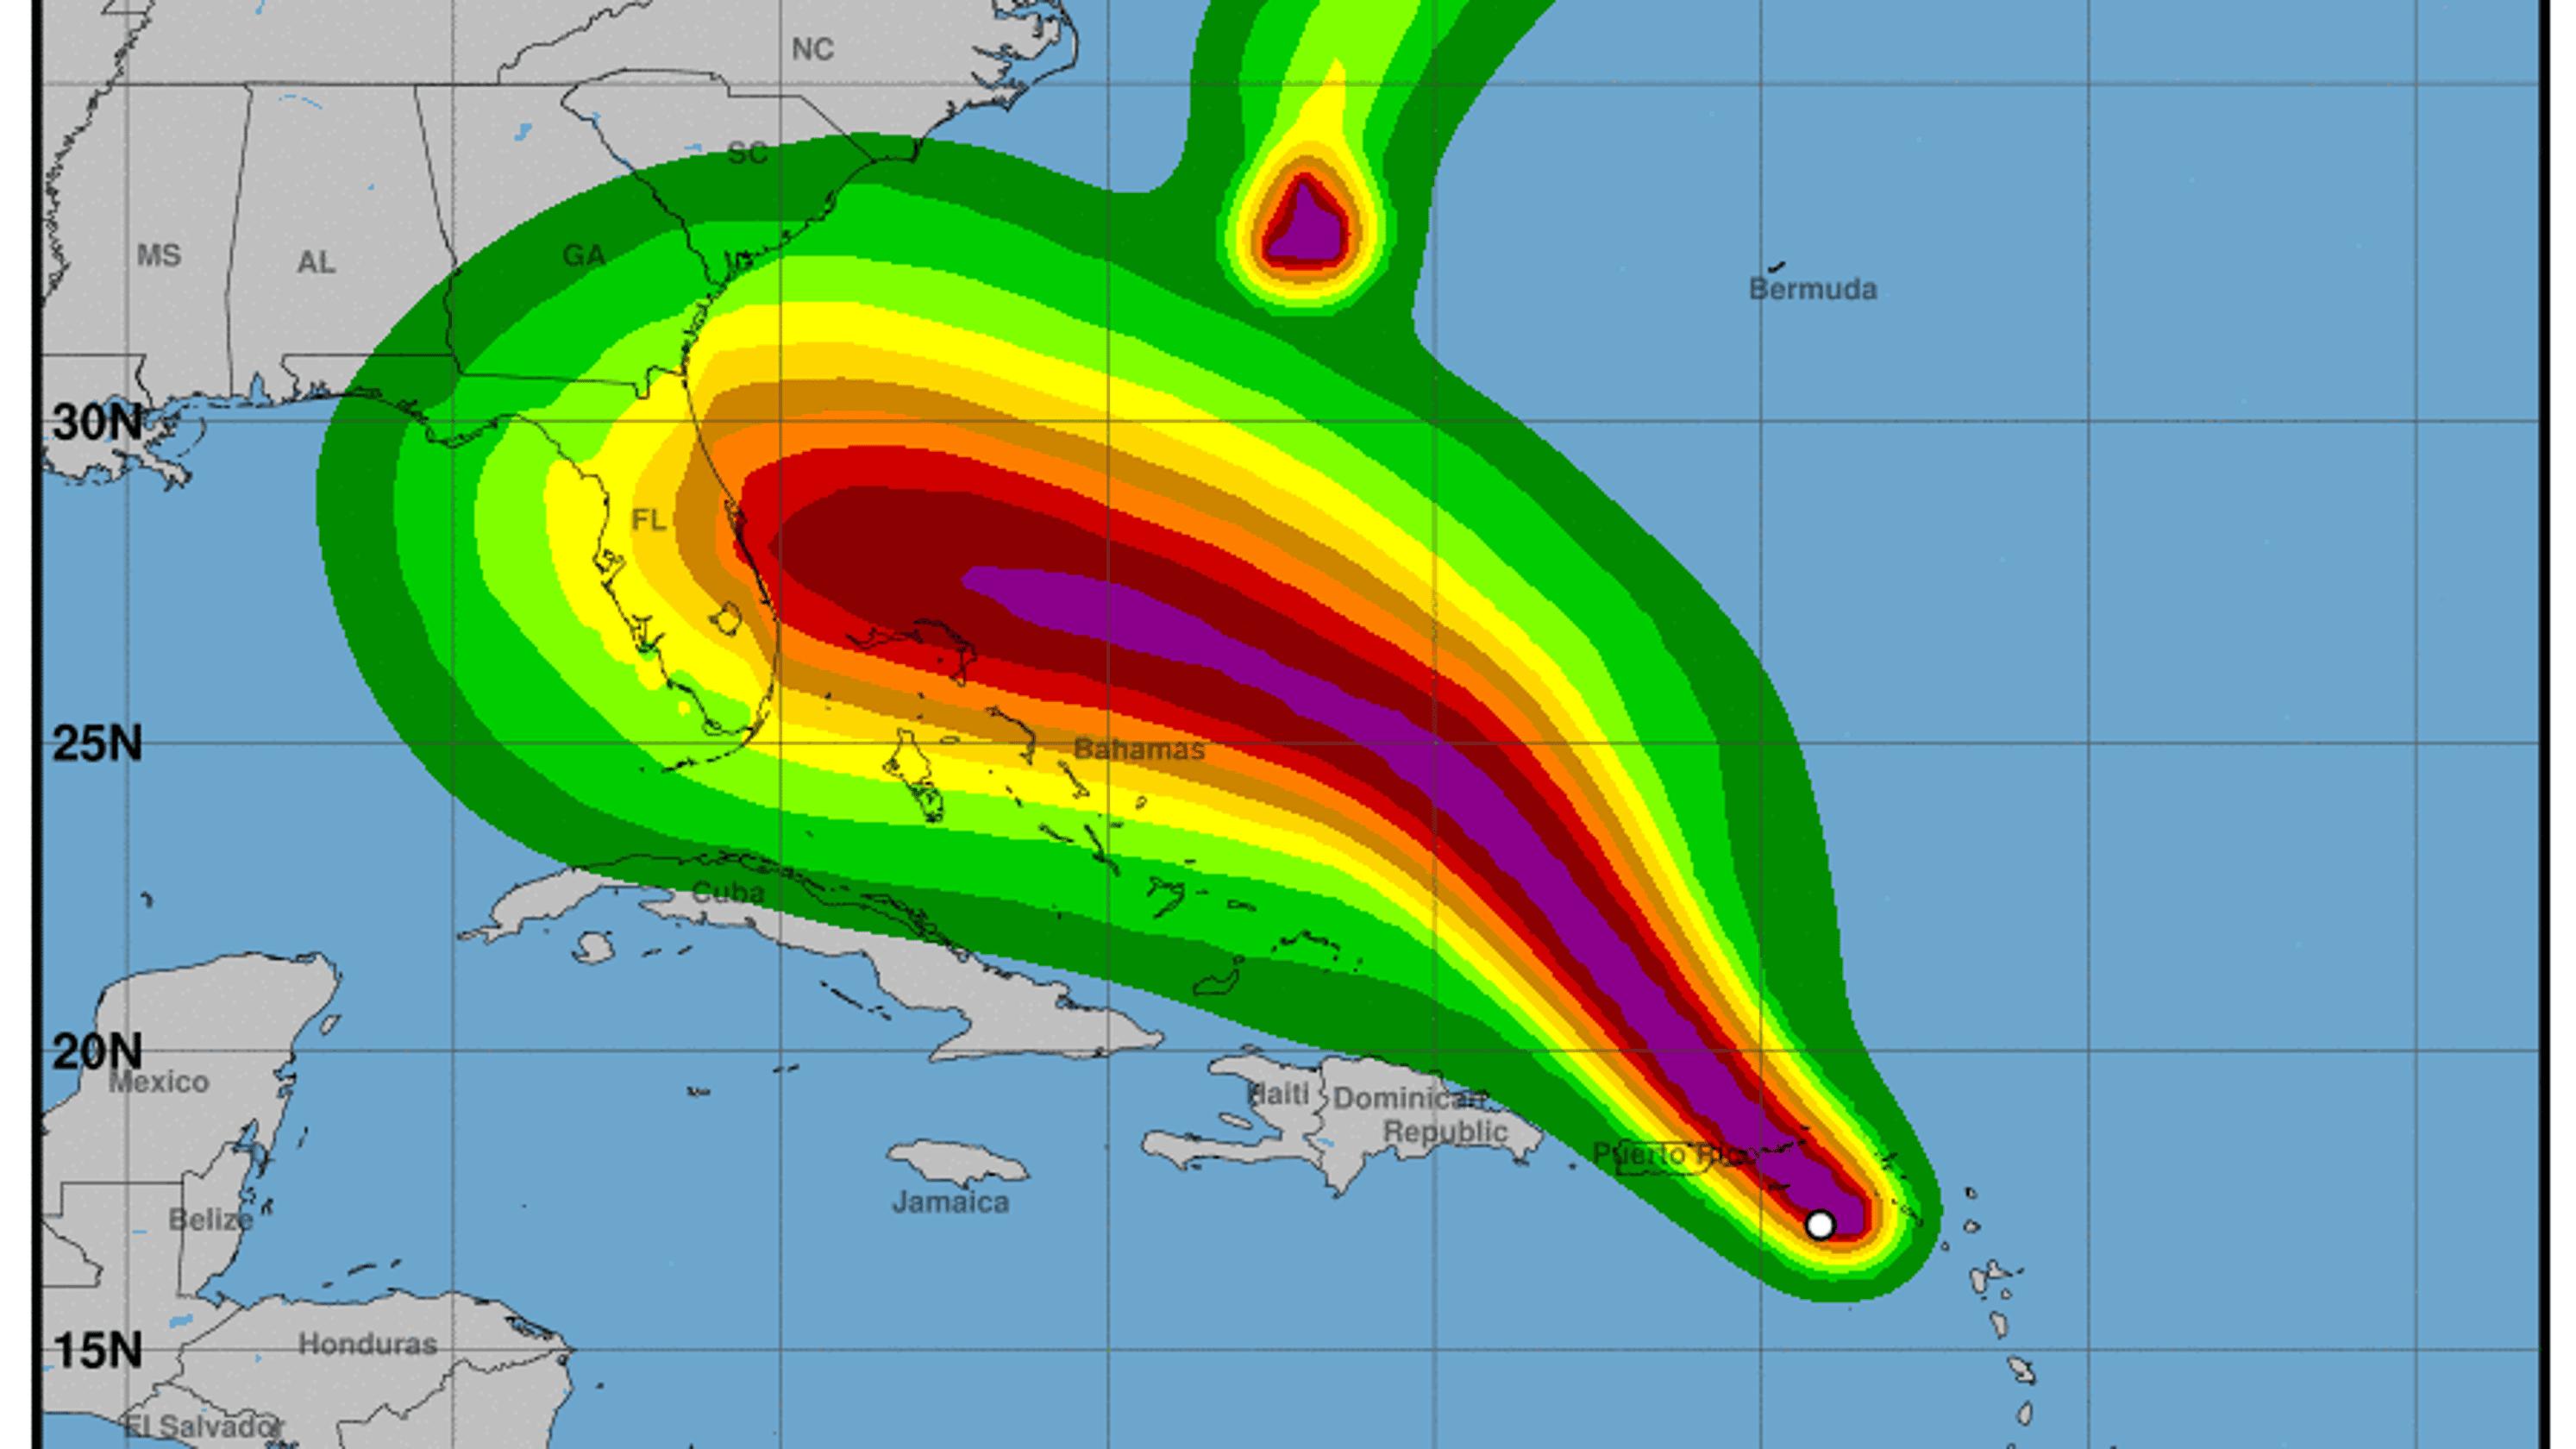 Will Hurricane Dorian strike Alabama? 'Too soon' to say, NWS